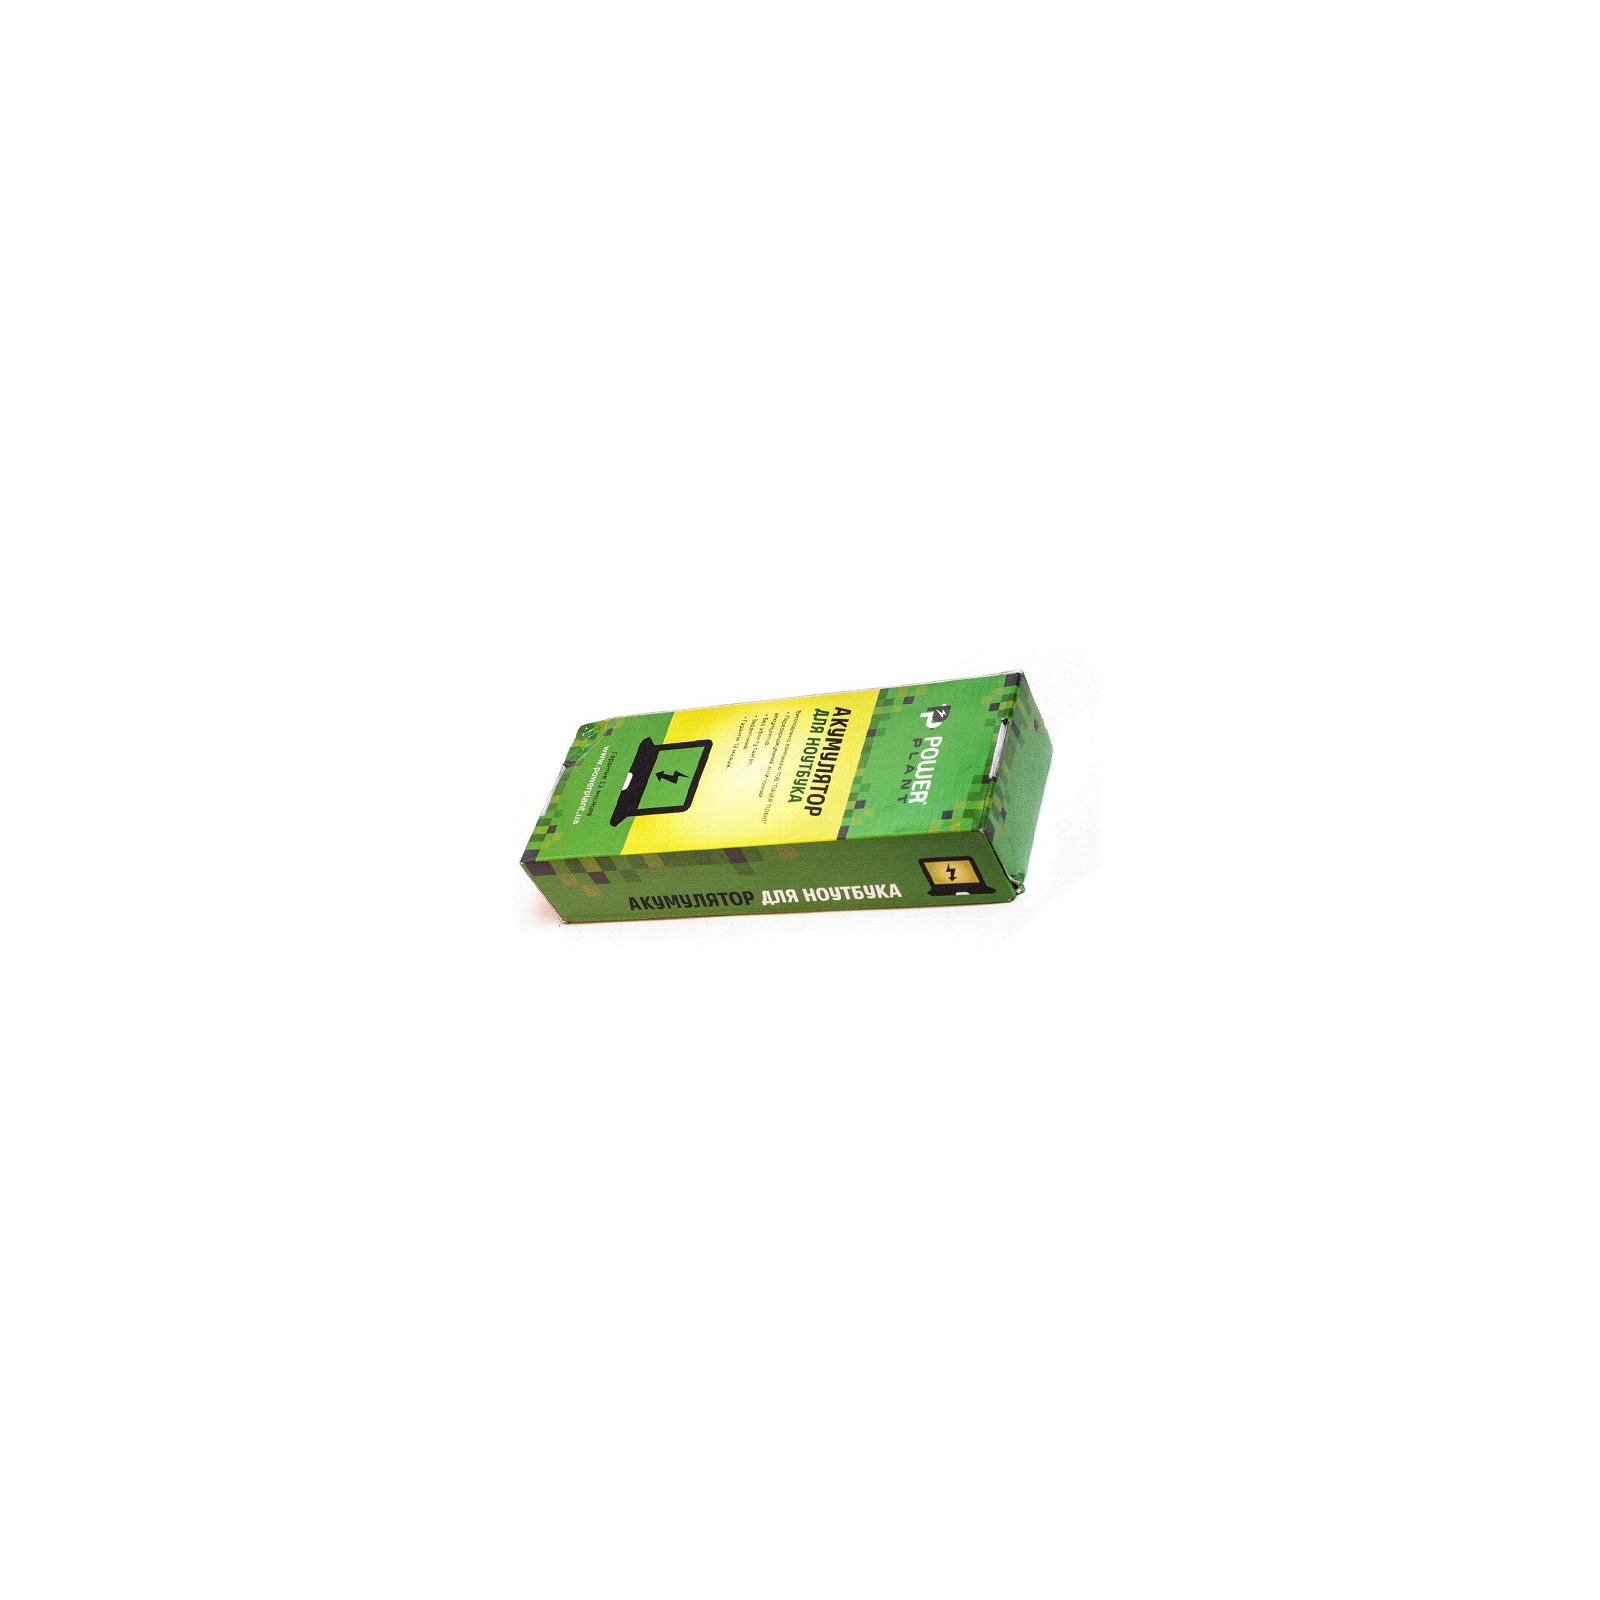 Аккумулятор для ноутбука LENOVO S10-2 (L09C3B11, S10-2) 11.1V 5200mAh PowerPlant (NB00000132) изображение 3